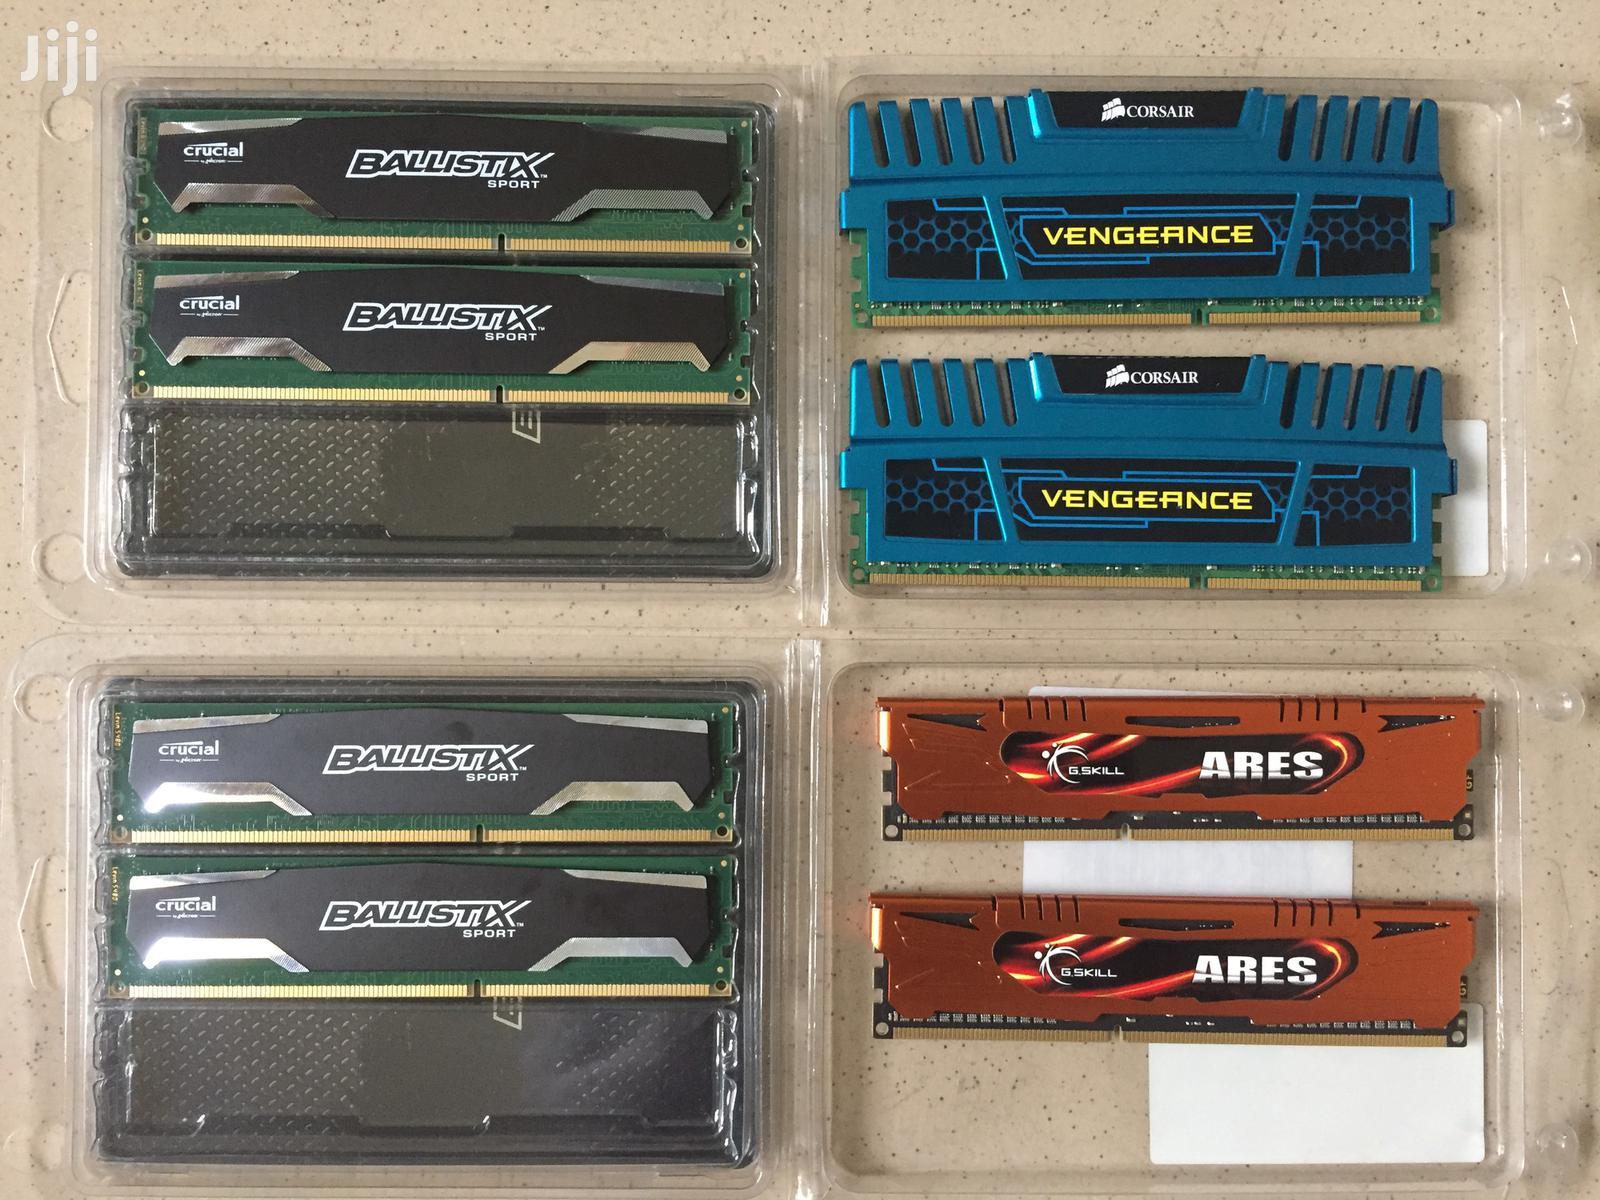 Ddr3 Desktop Ram / Memory | Computer Hardware for sale in Adabraka, Greater Accra, Ghana